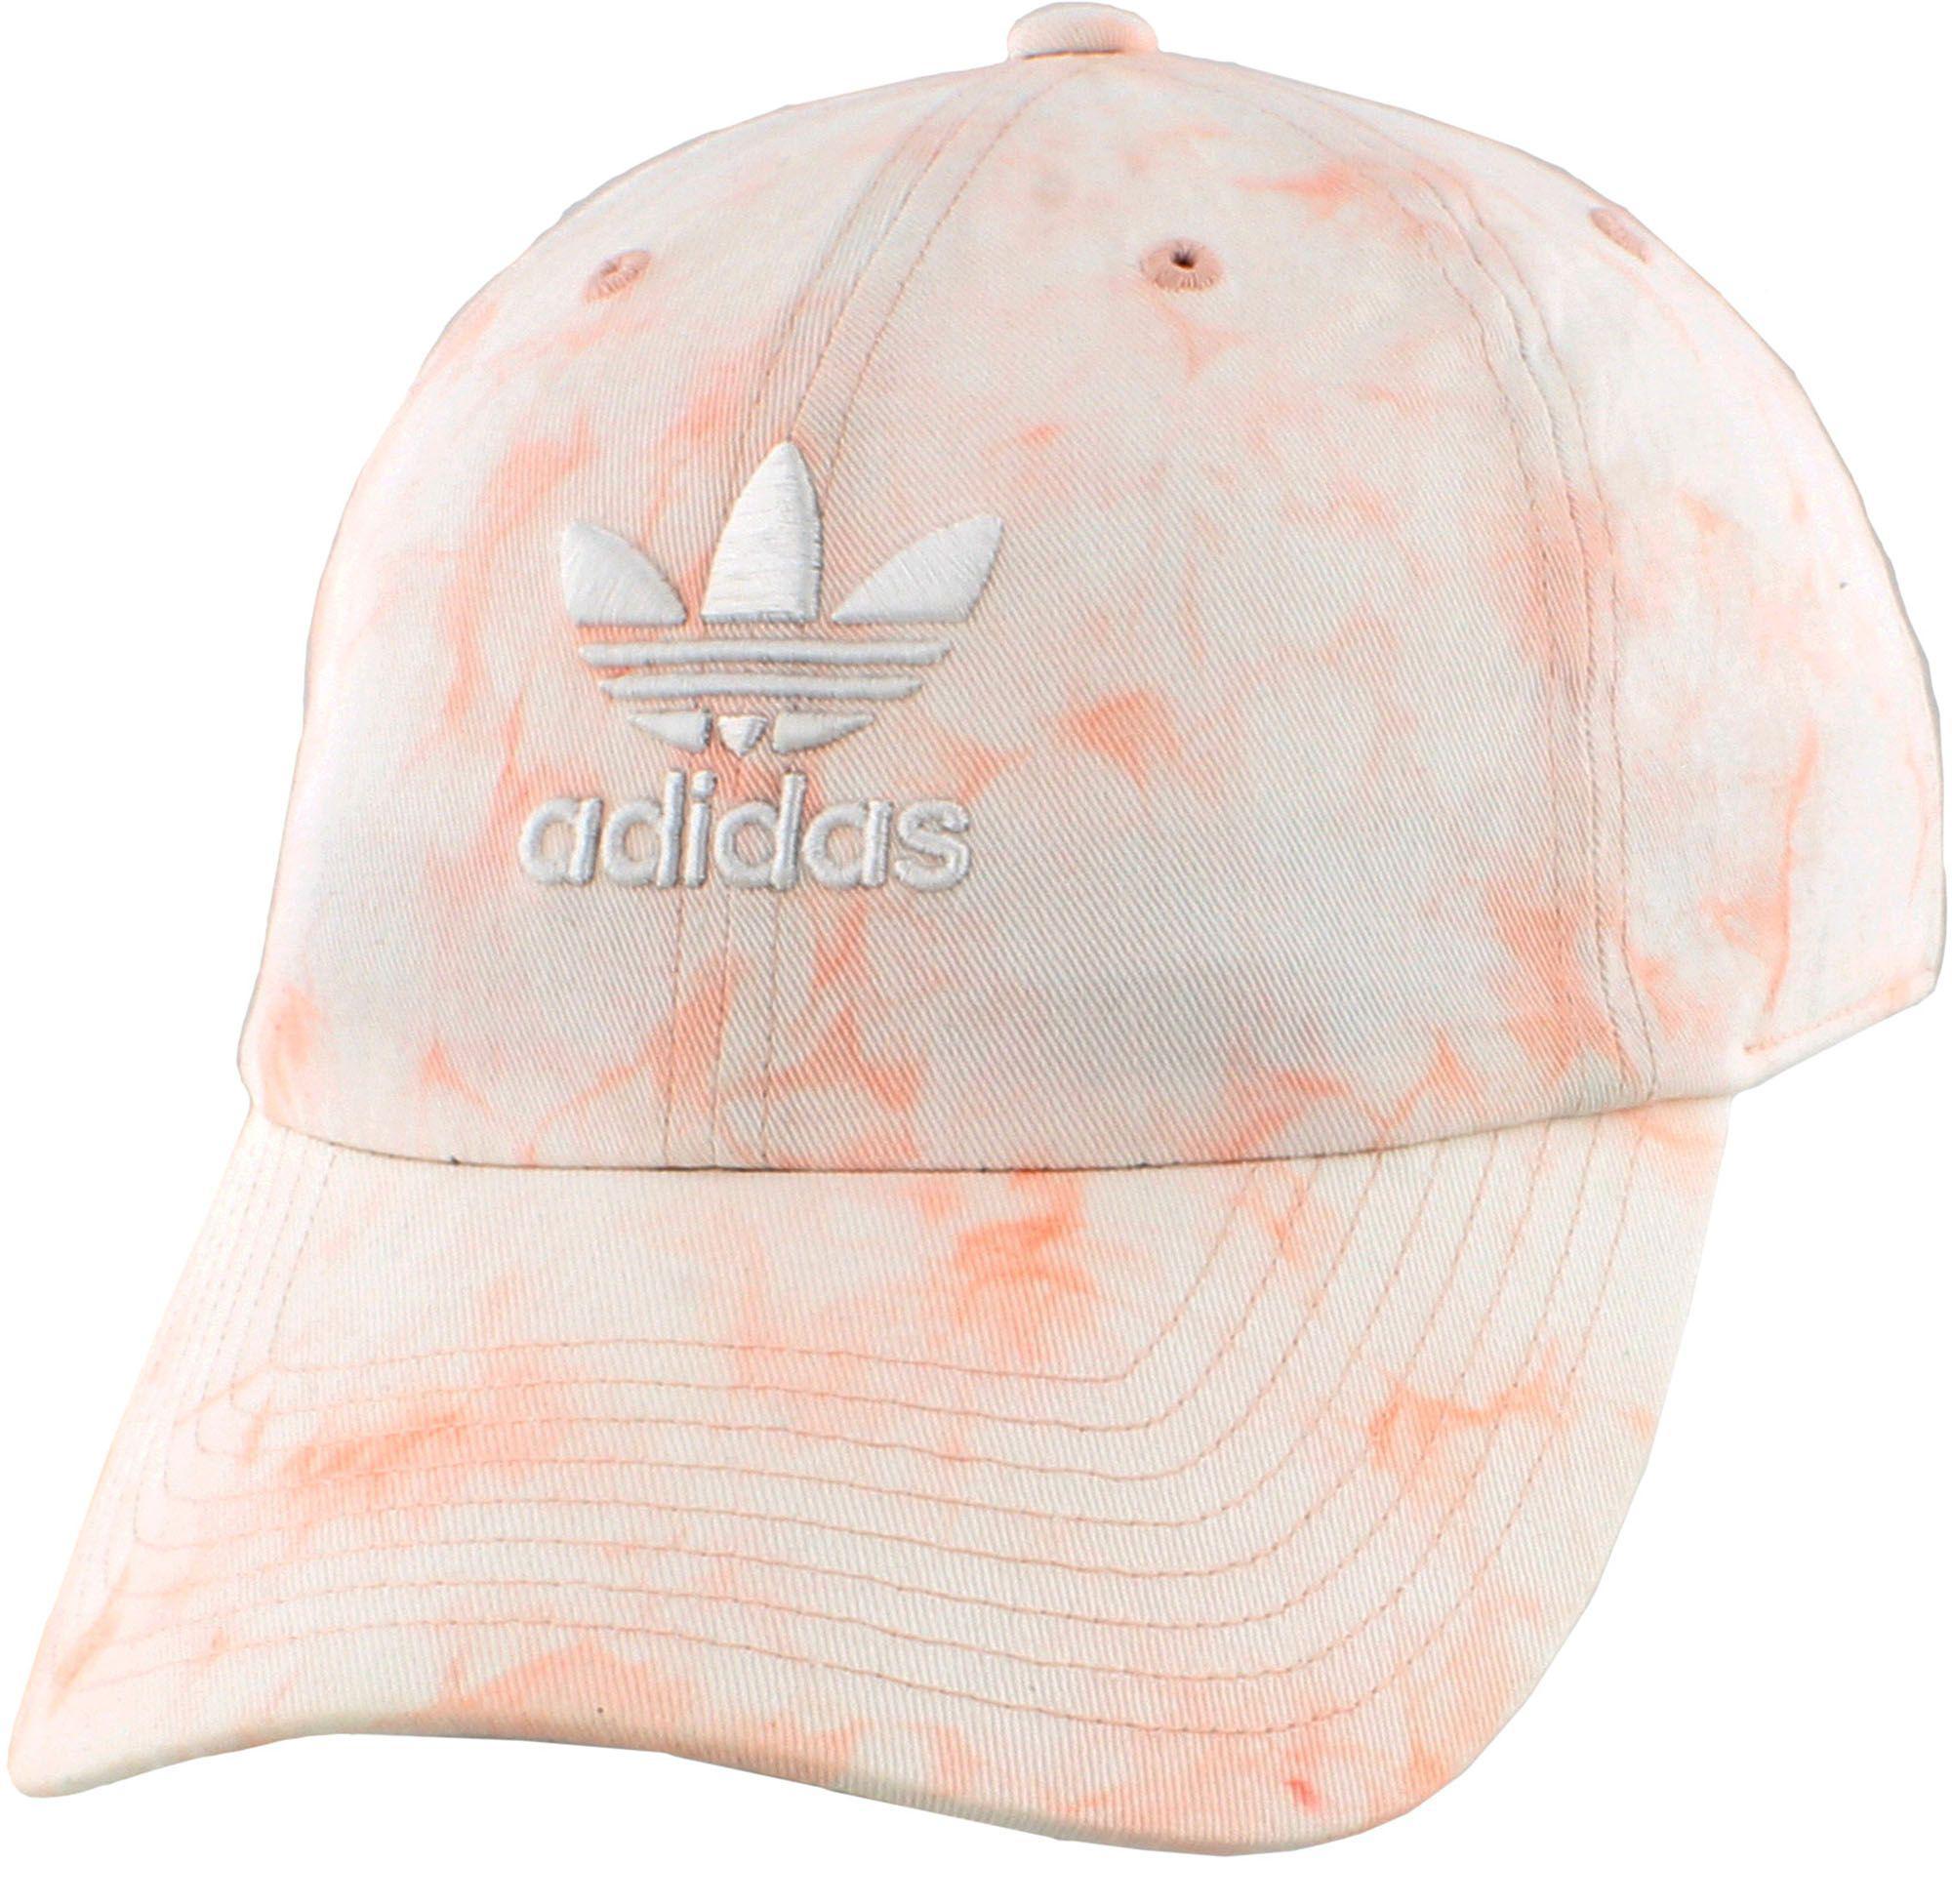 623b70b1c13 Lyst - adidas Originals Relaxed Tie Dye Strapback Hat in Pink